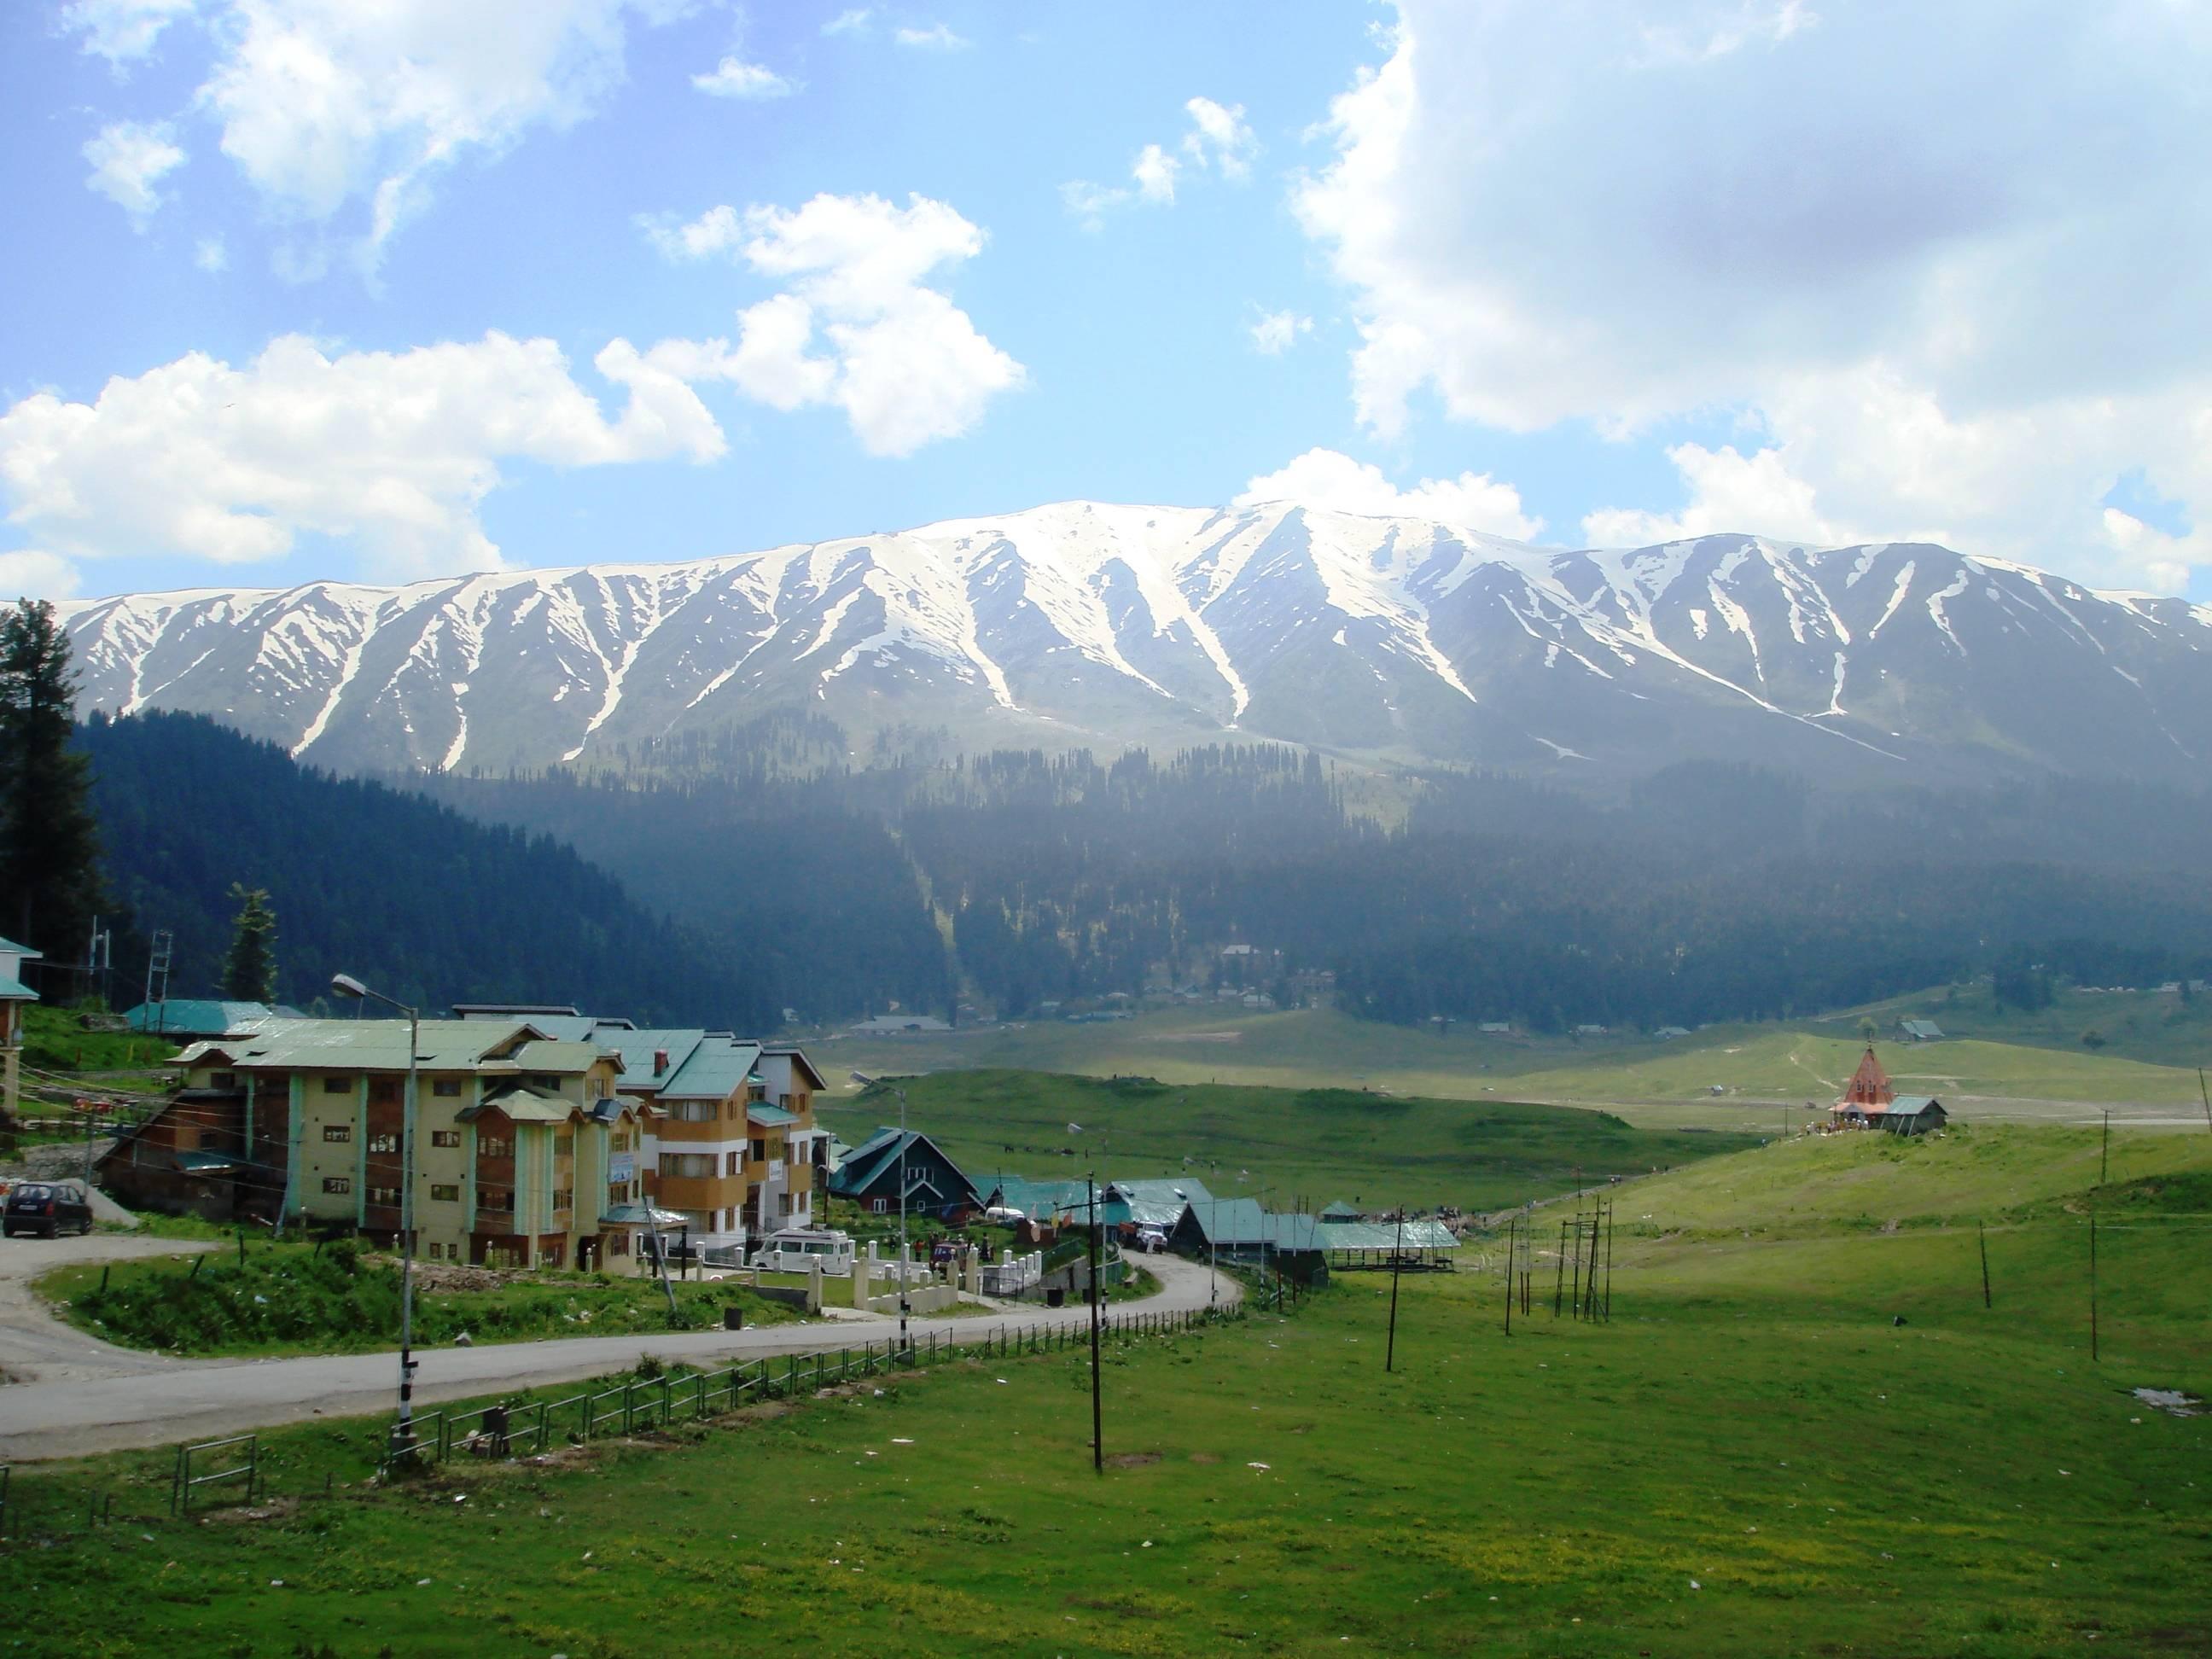 Beautiful Kashmir Photos-23 Pics - www. FunMag.org Gulmarg photos in september